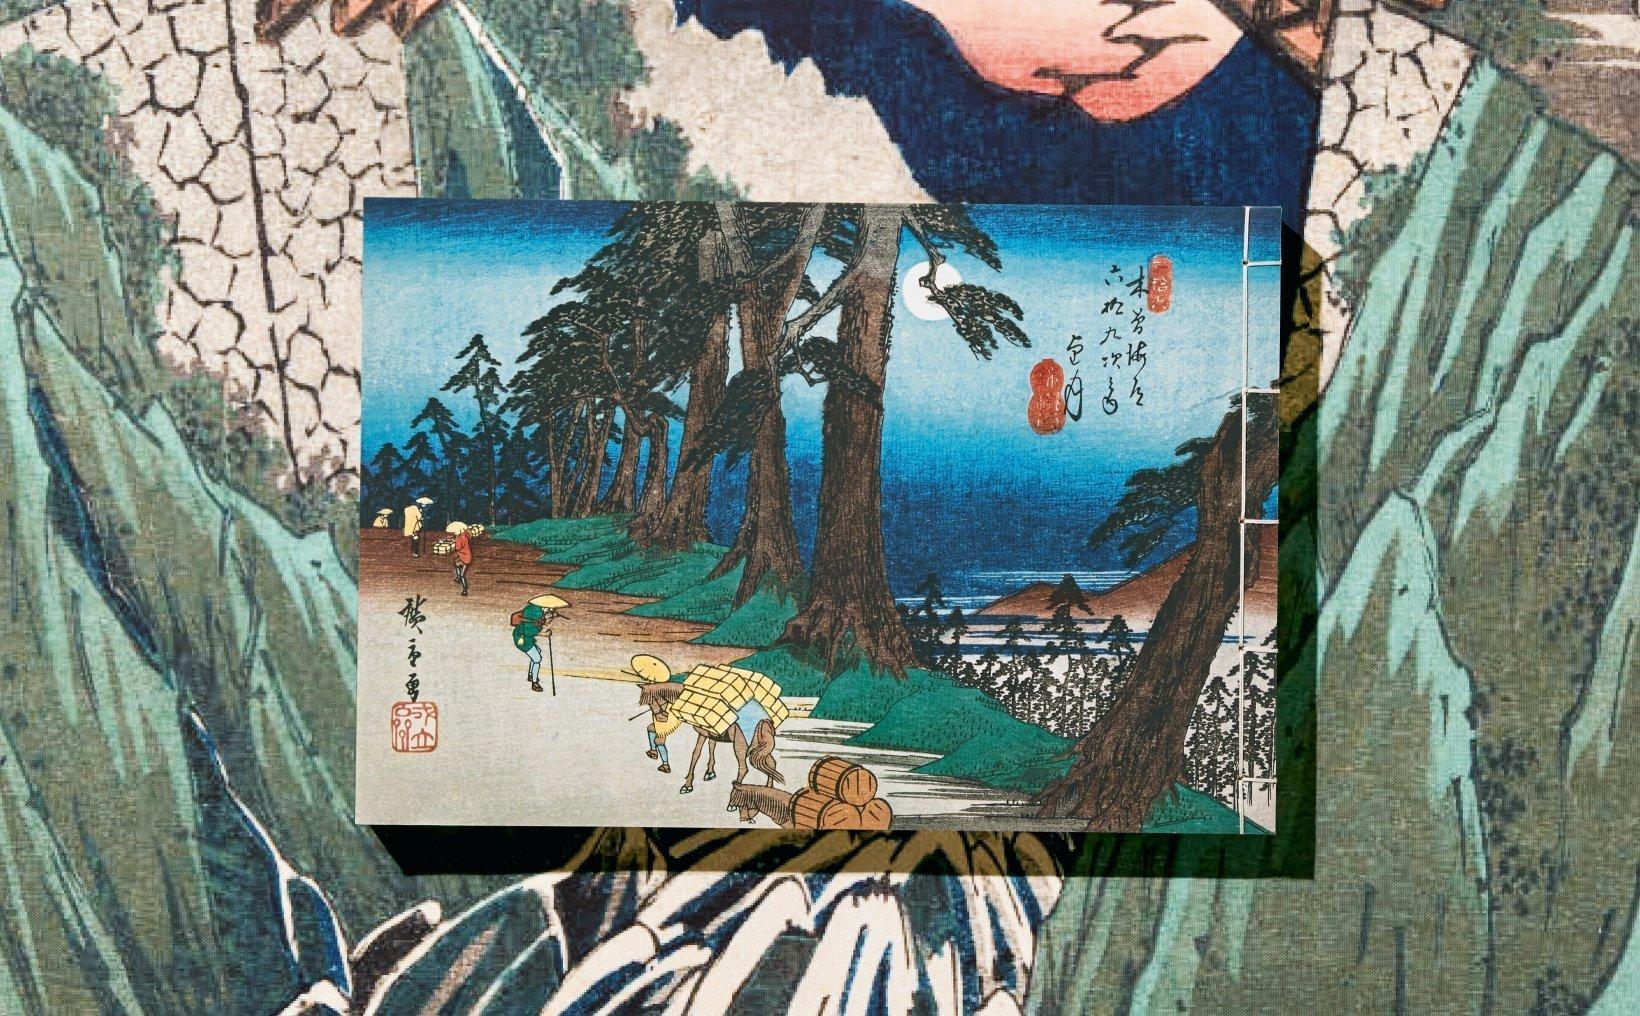 Hiroshige & Eisen: The Sixty-Nine Stations along the Kisokaido (Multilingual Edition)